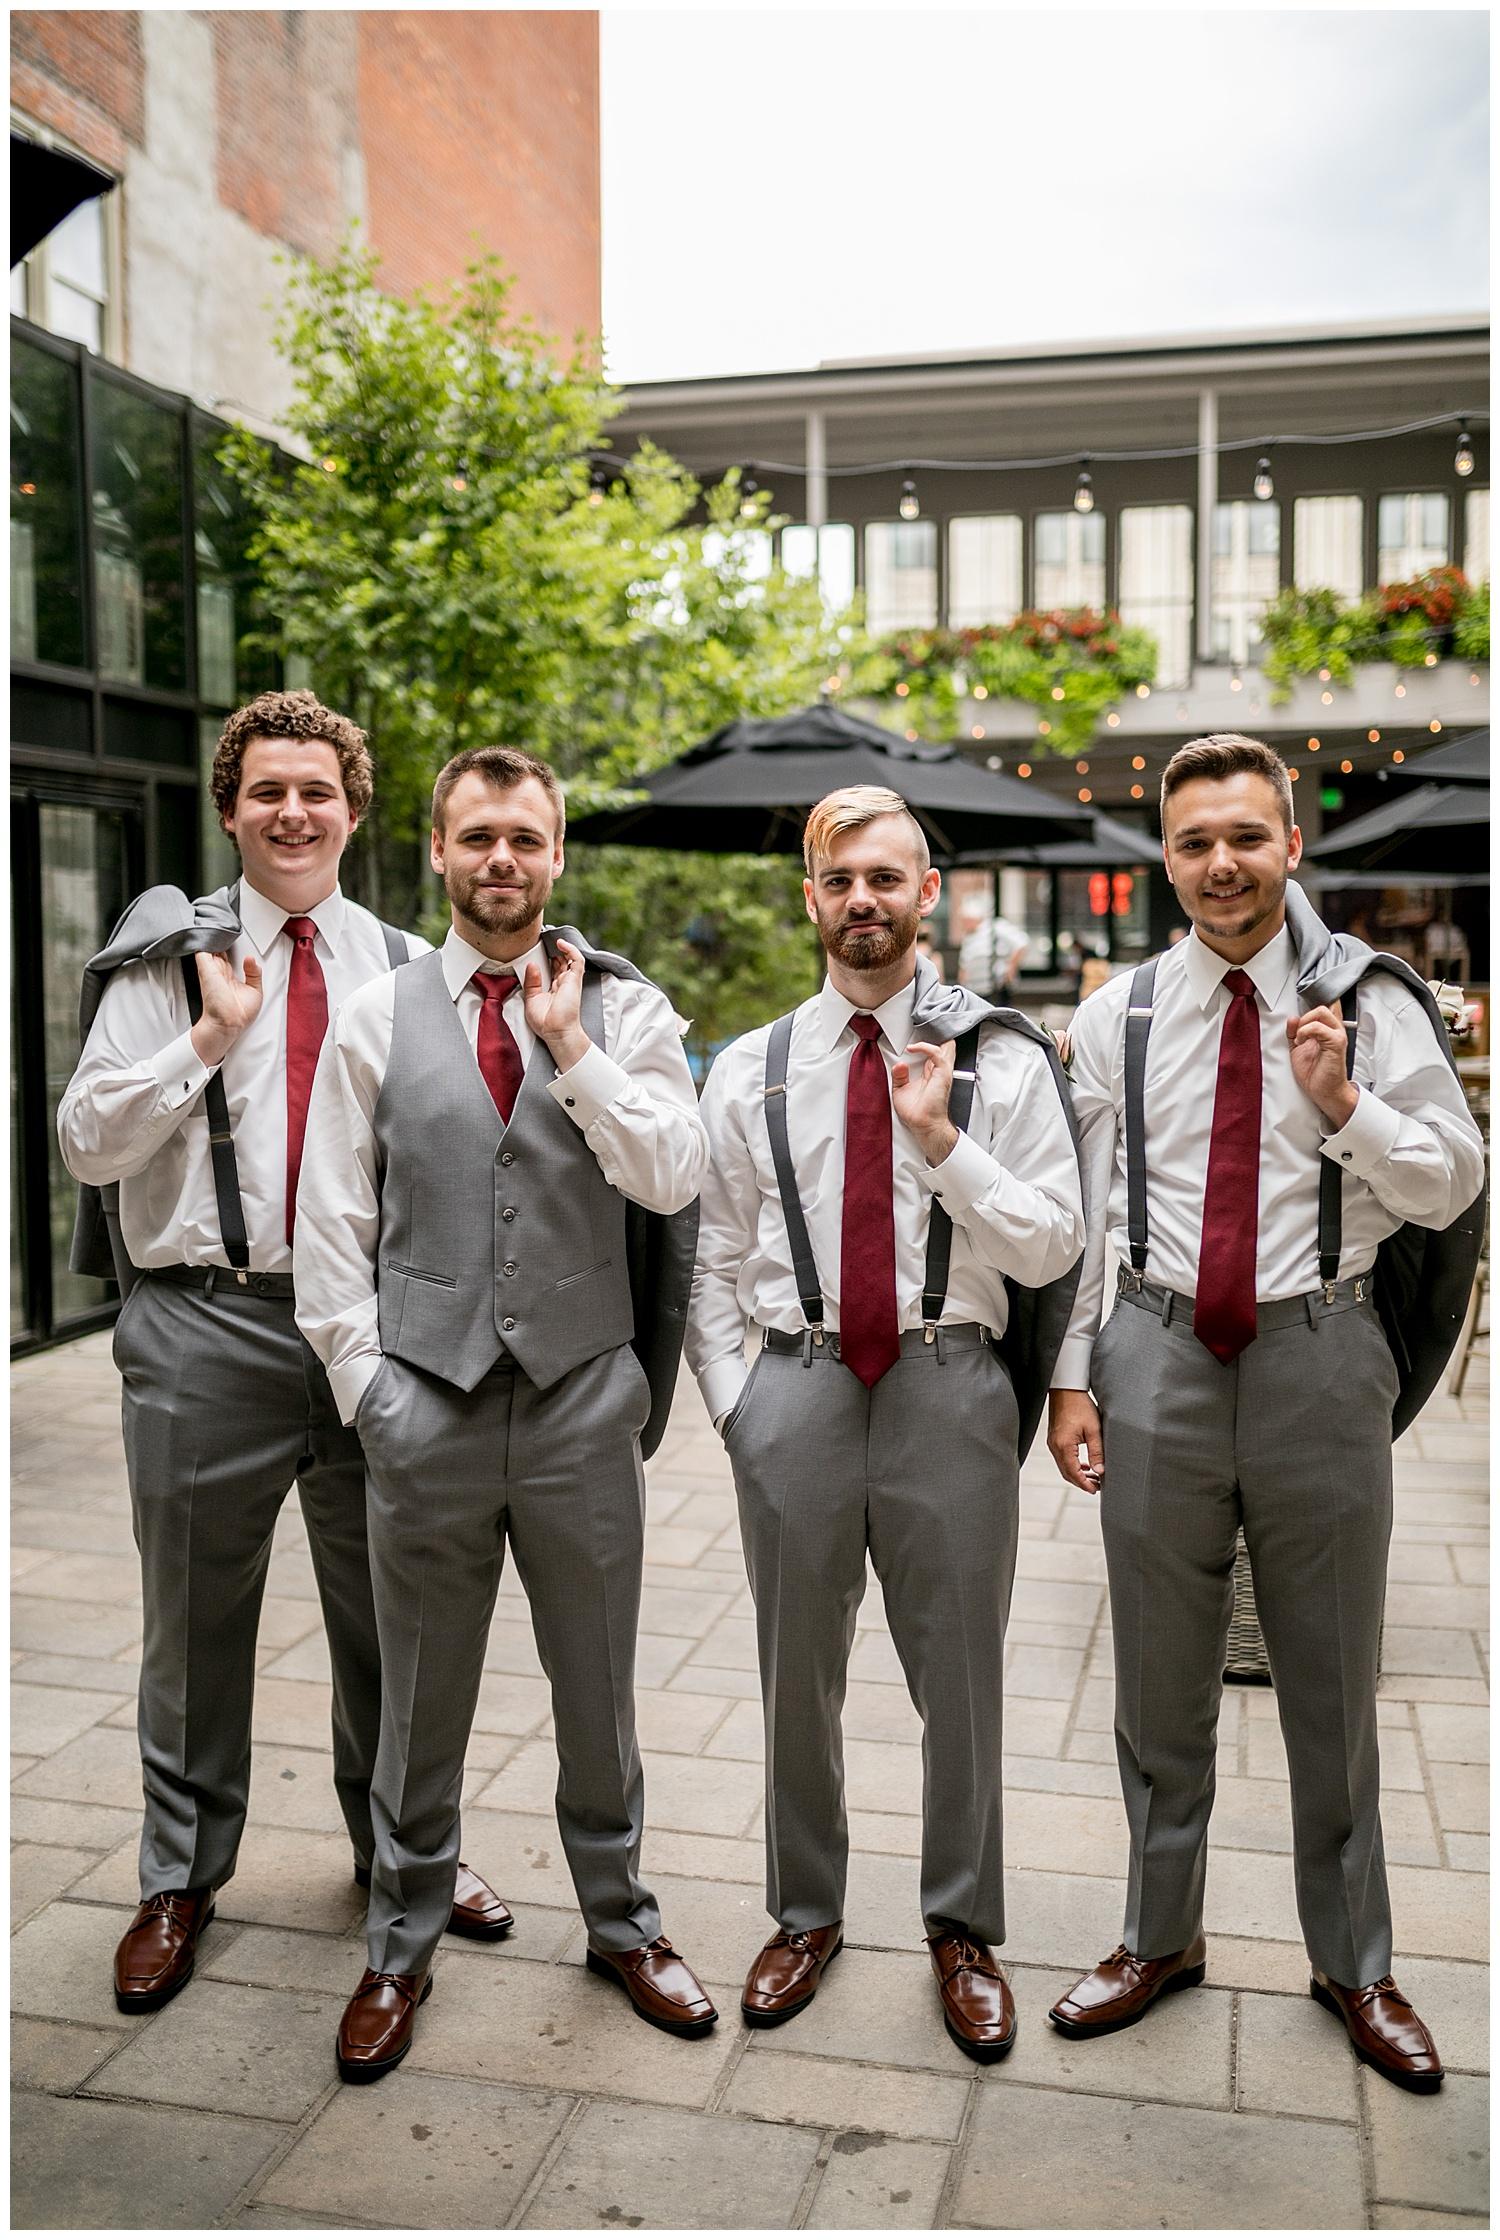 TheSmythCollective-Best-Cincinnati-Wedding-Photographer-Urban-Downtown-Covington-Wedding-19.jpg